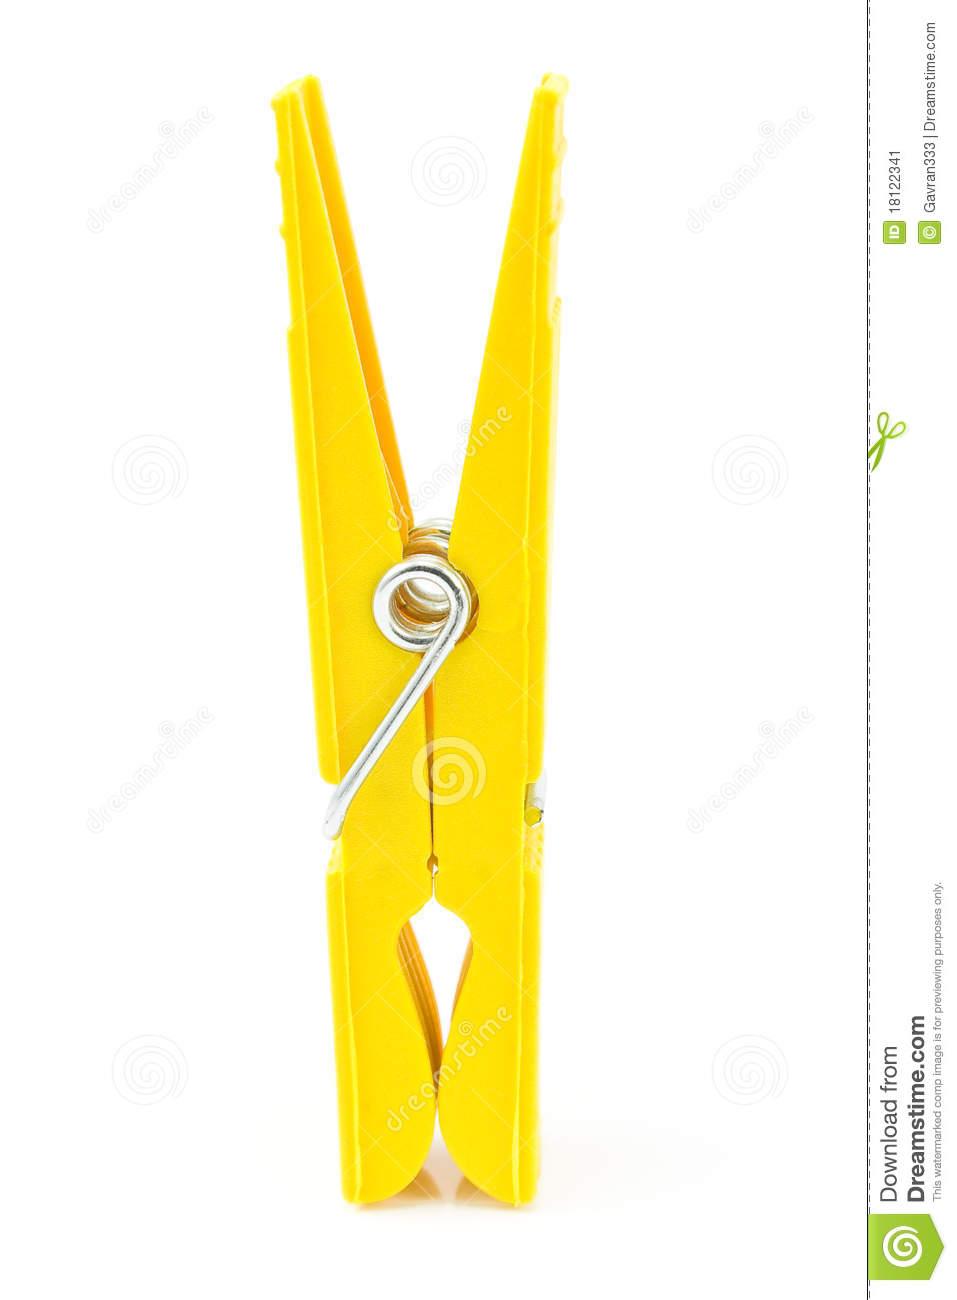 Clothes peg clipart - Clipground